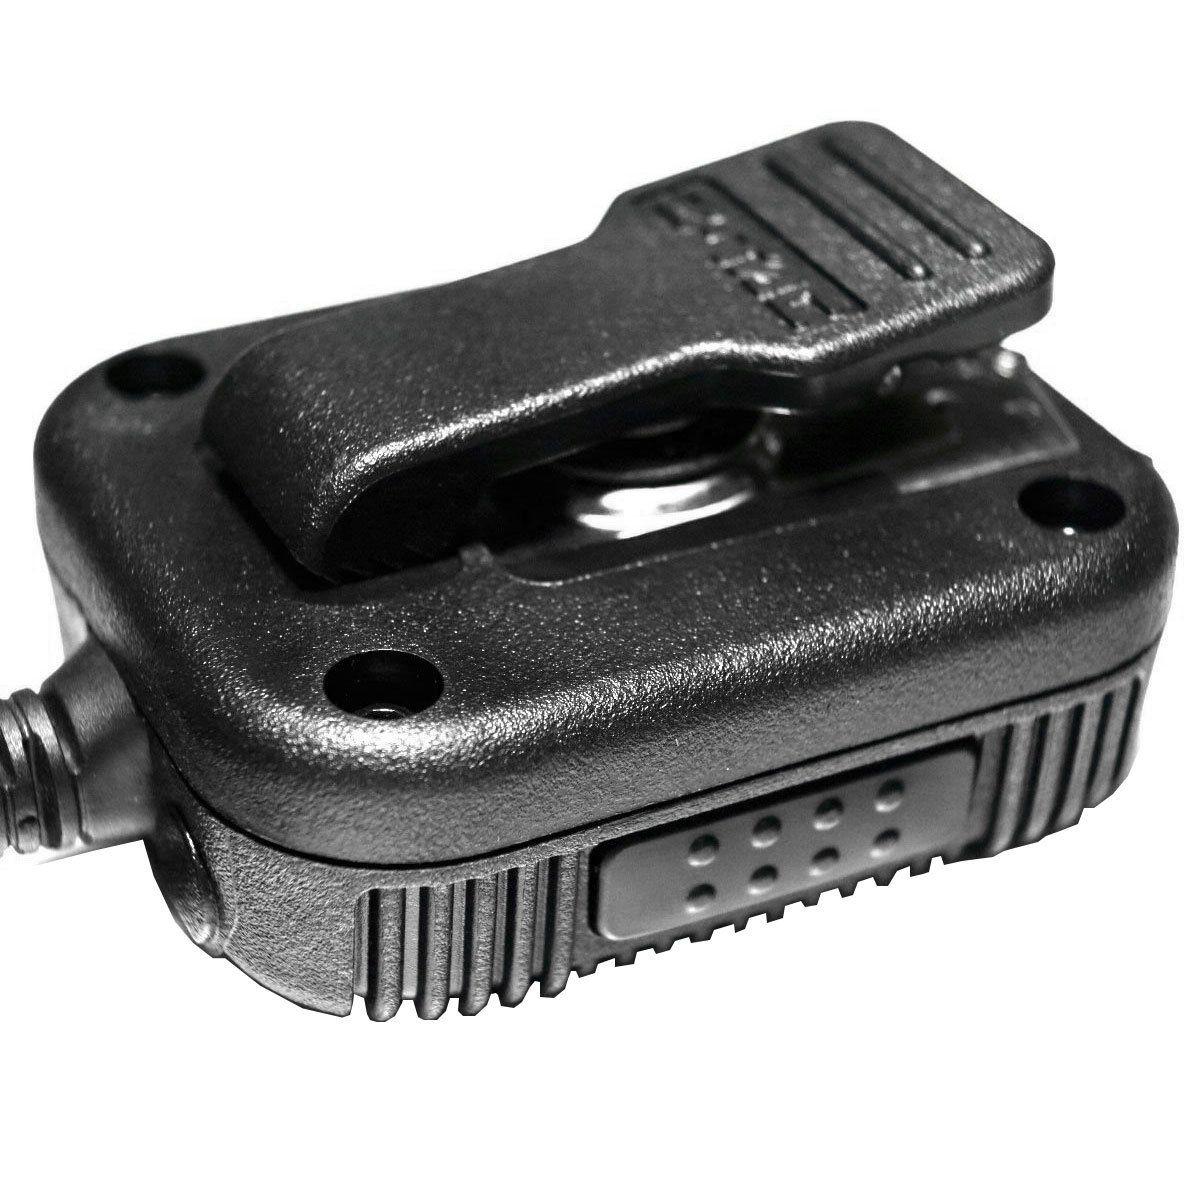 Chave Interruptor Para Rádio Comunicador Z 126 Ztac